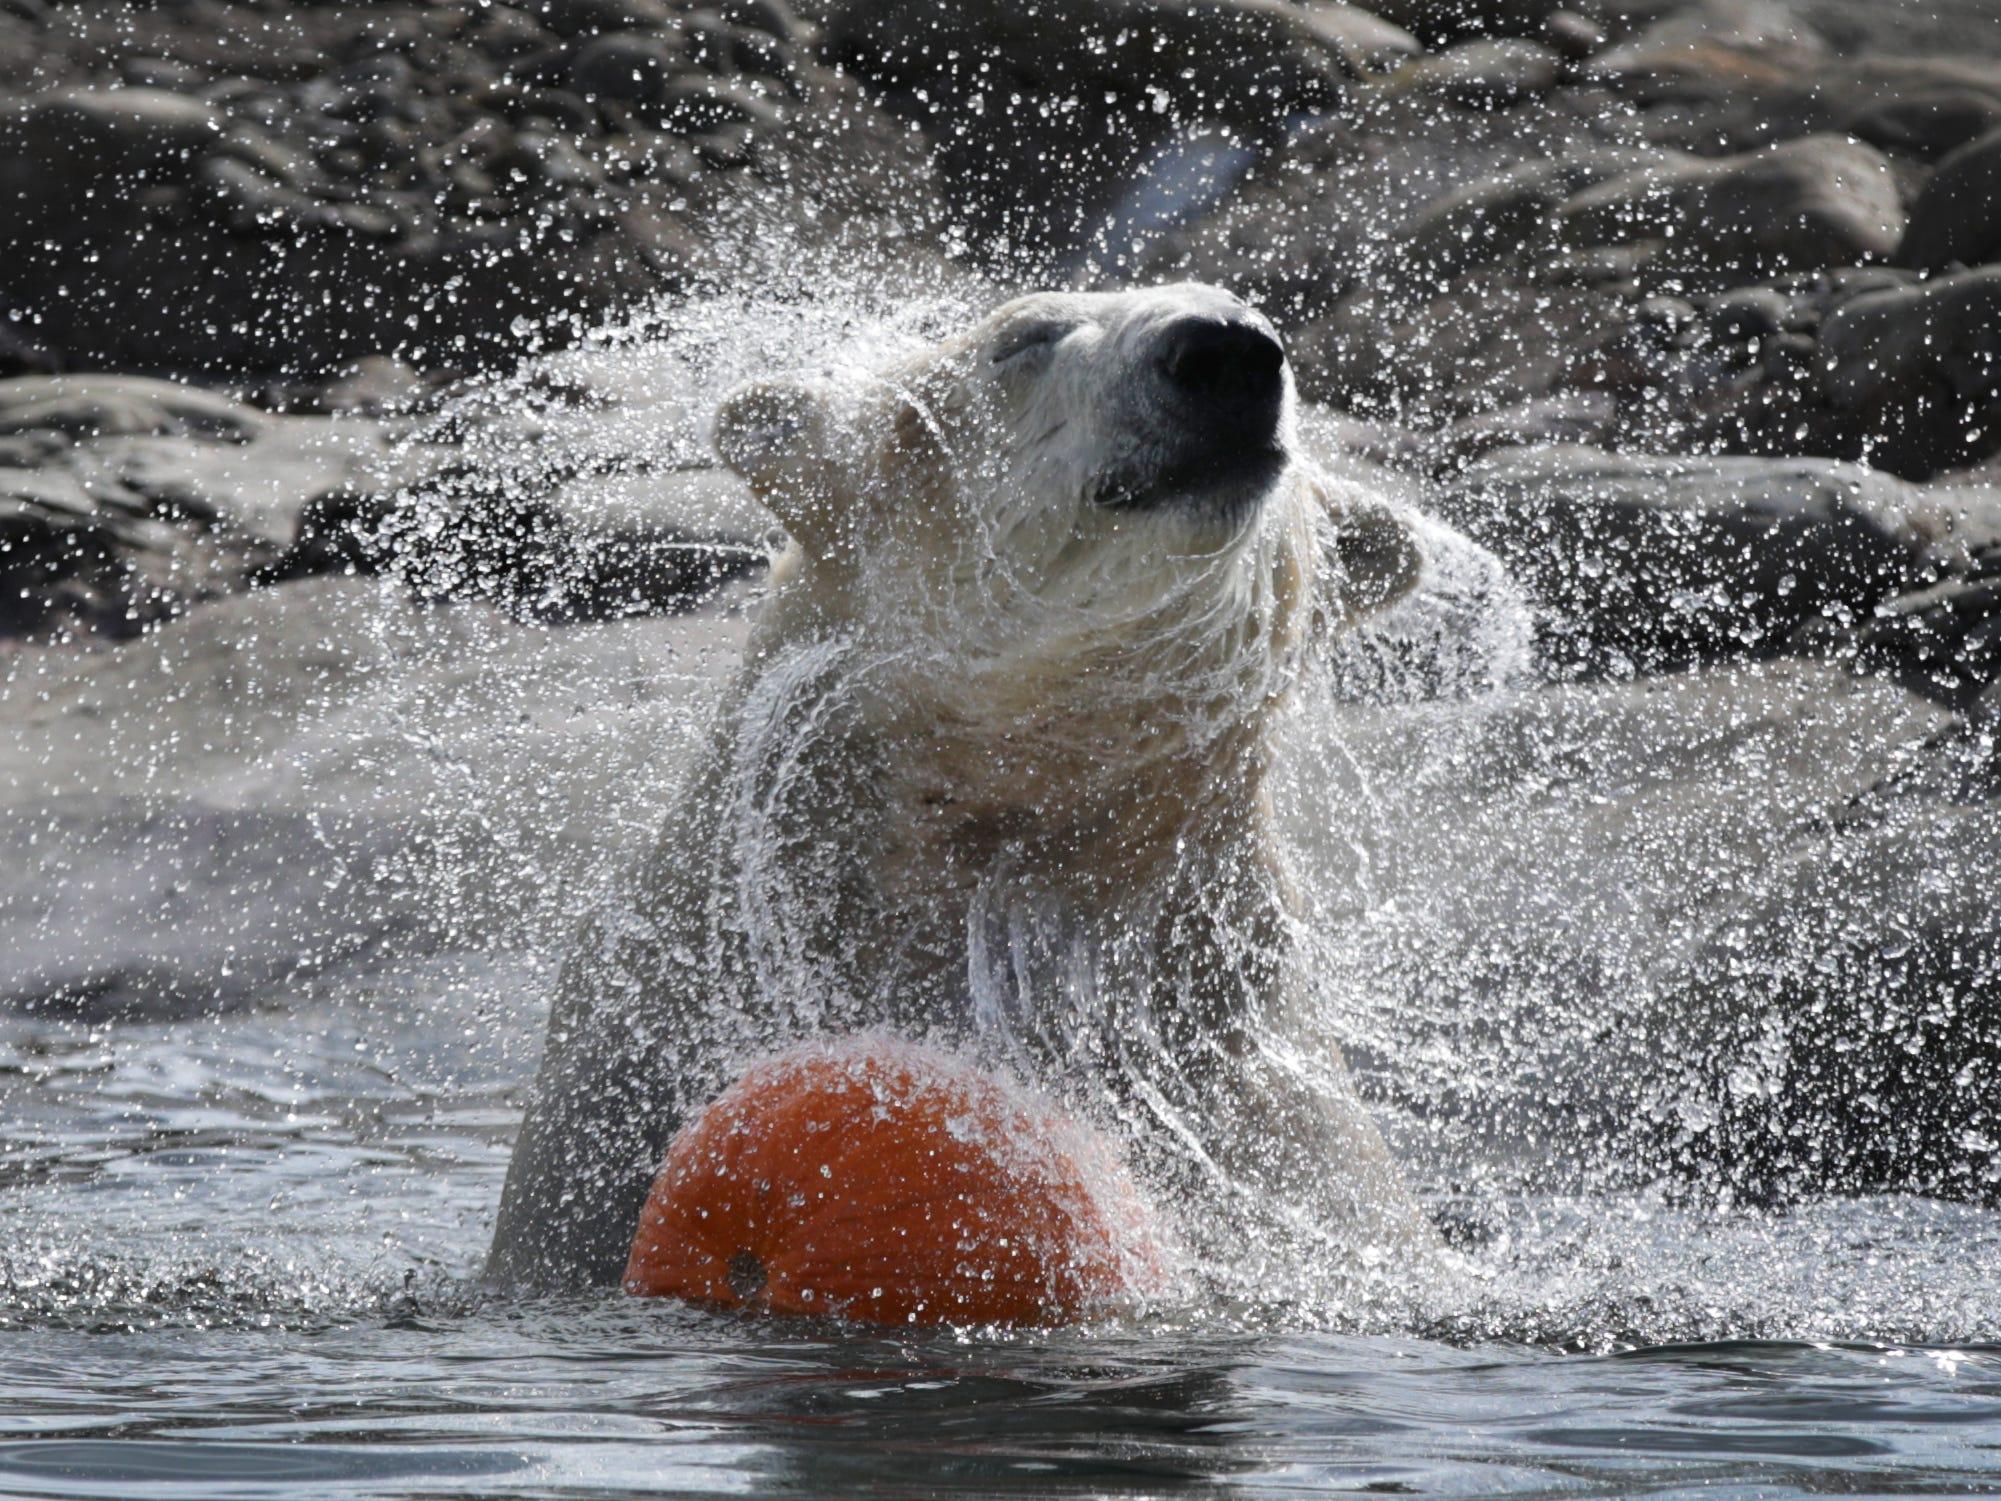 A polar bear eats a pumpkins at the Detroit Zoo in Royal Oak on Wednesday, October 10, 2018.